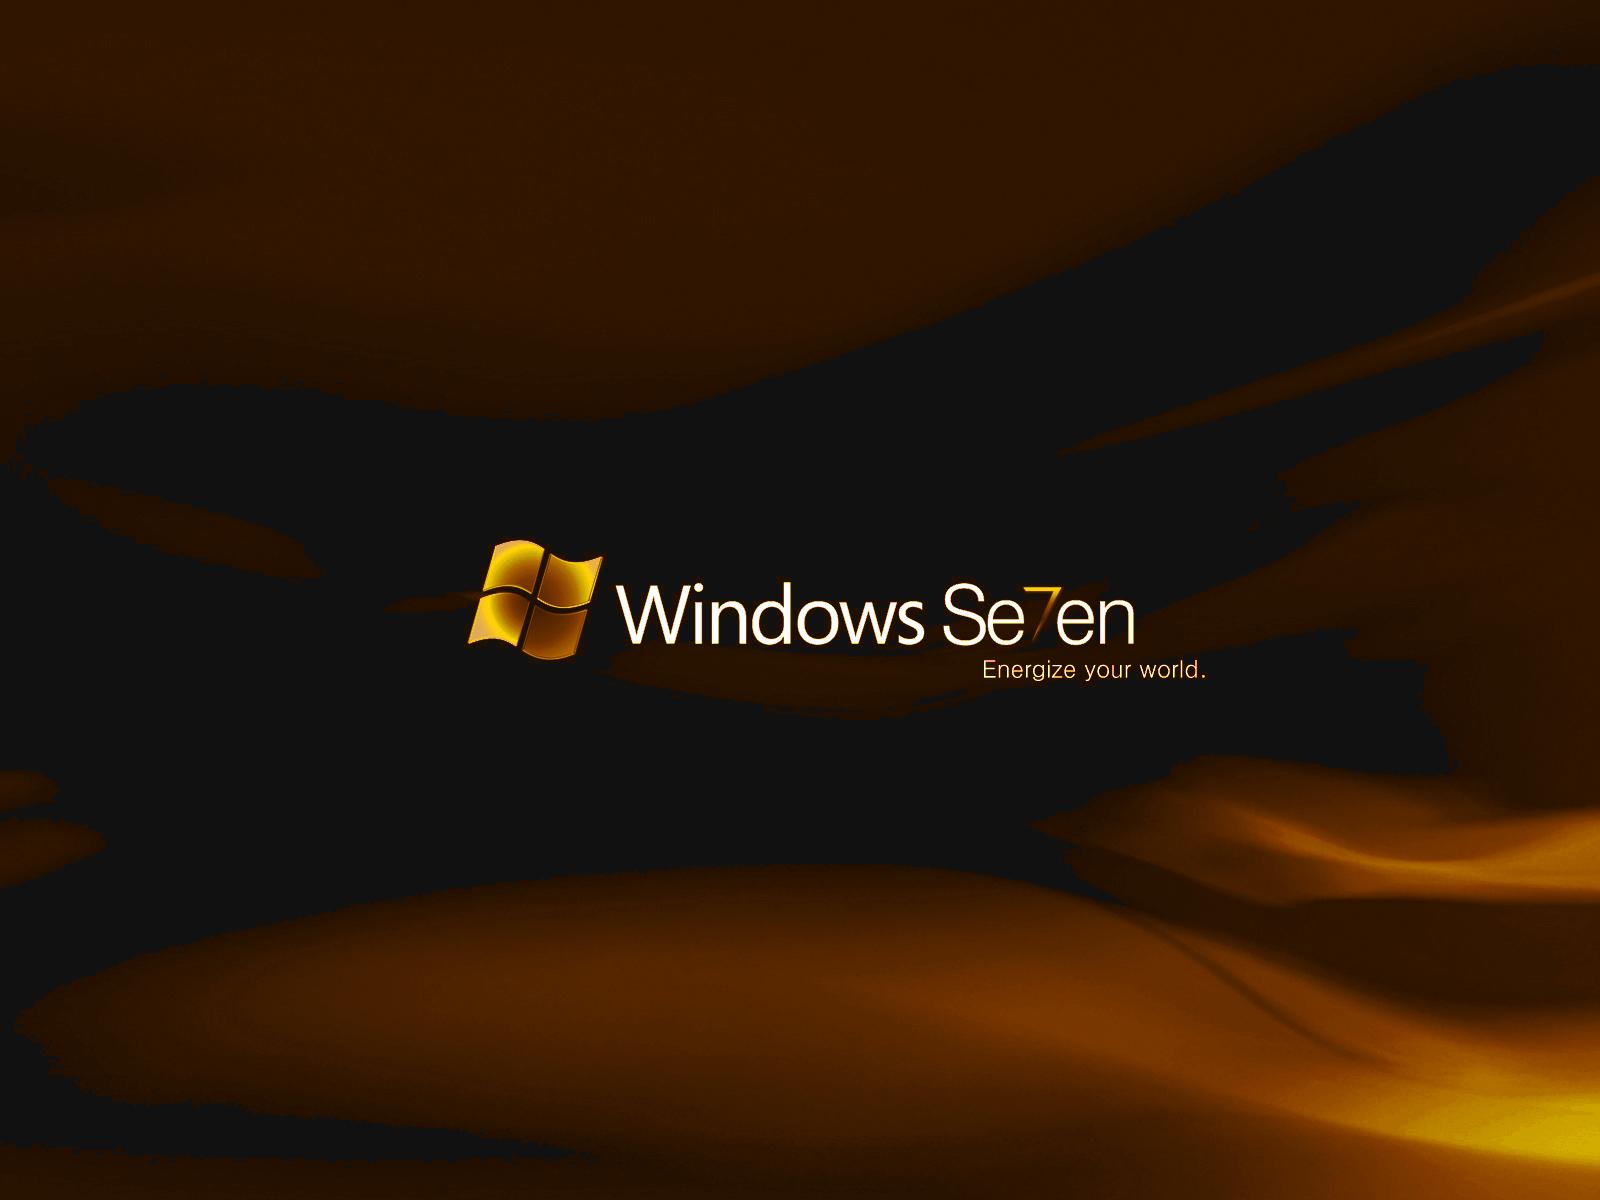 http://2.bp.blogspot.com/-ncLVANwI_QI/T4zLJSEjUZI/AAAAAAAACPg/_cXFAudj_Gc/s1600/windows-7_014.jpg